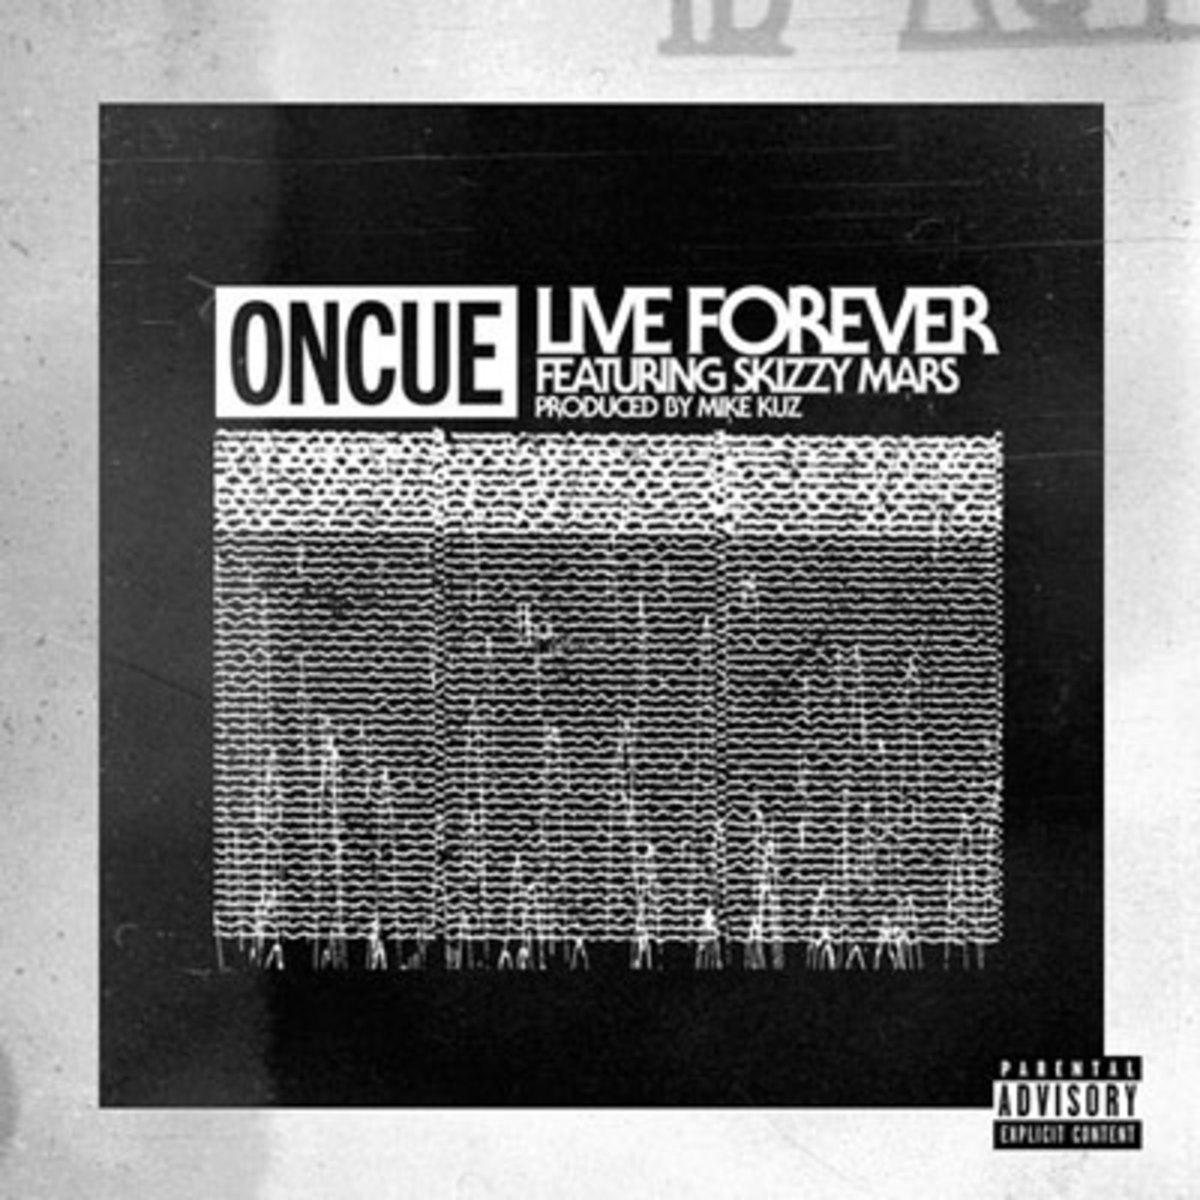 oncue-liveforever.jpg